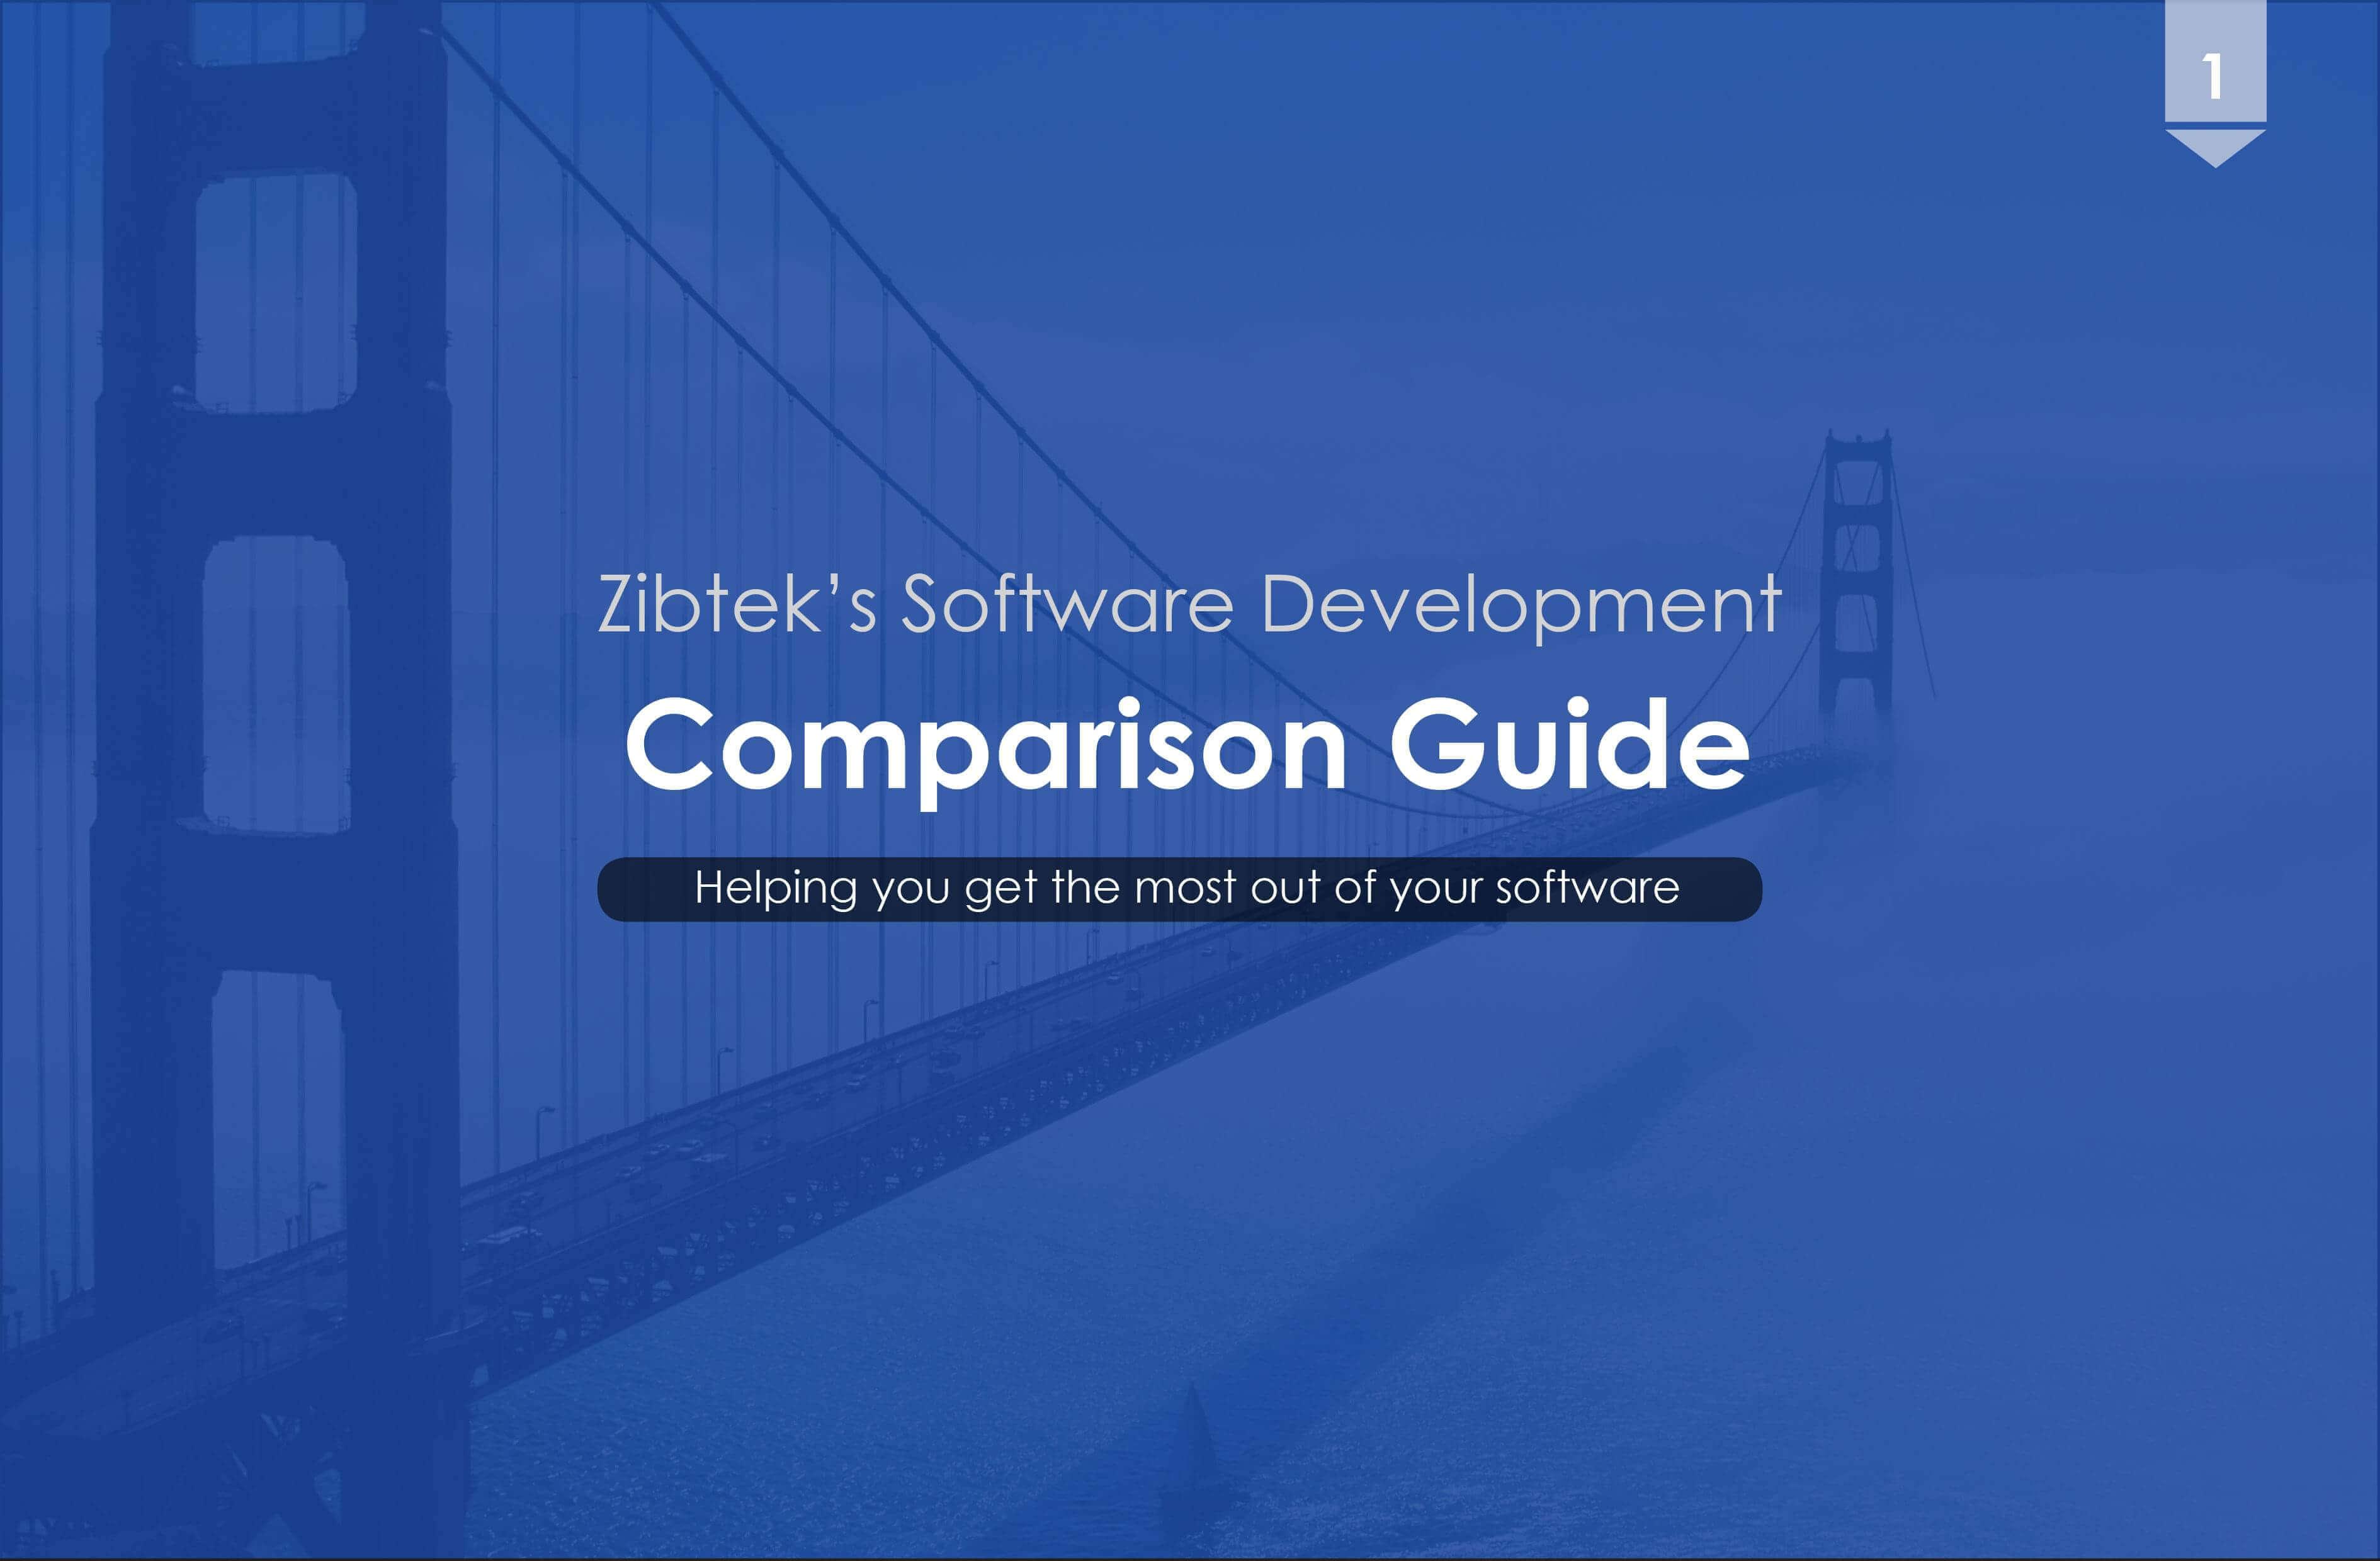 Zibtek's Software Development Comparison Guide